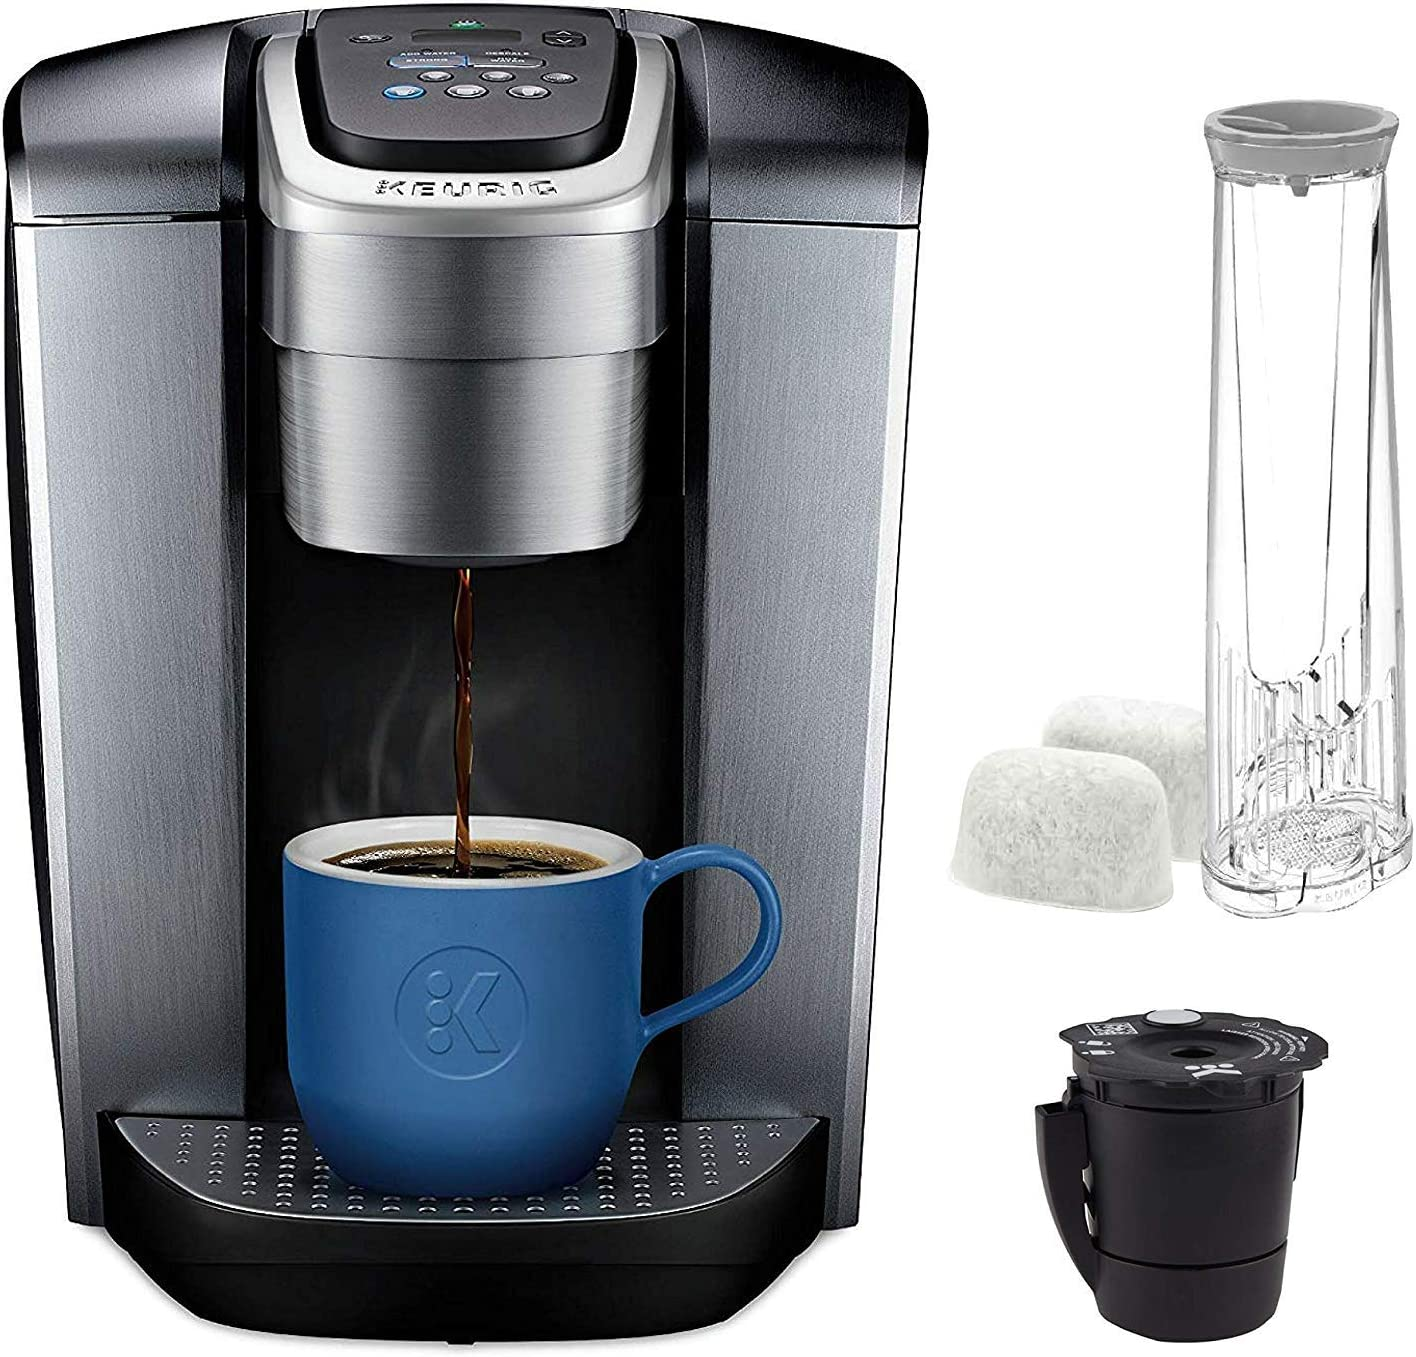 Good Smart Coffee Maker